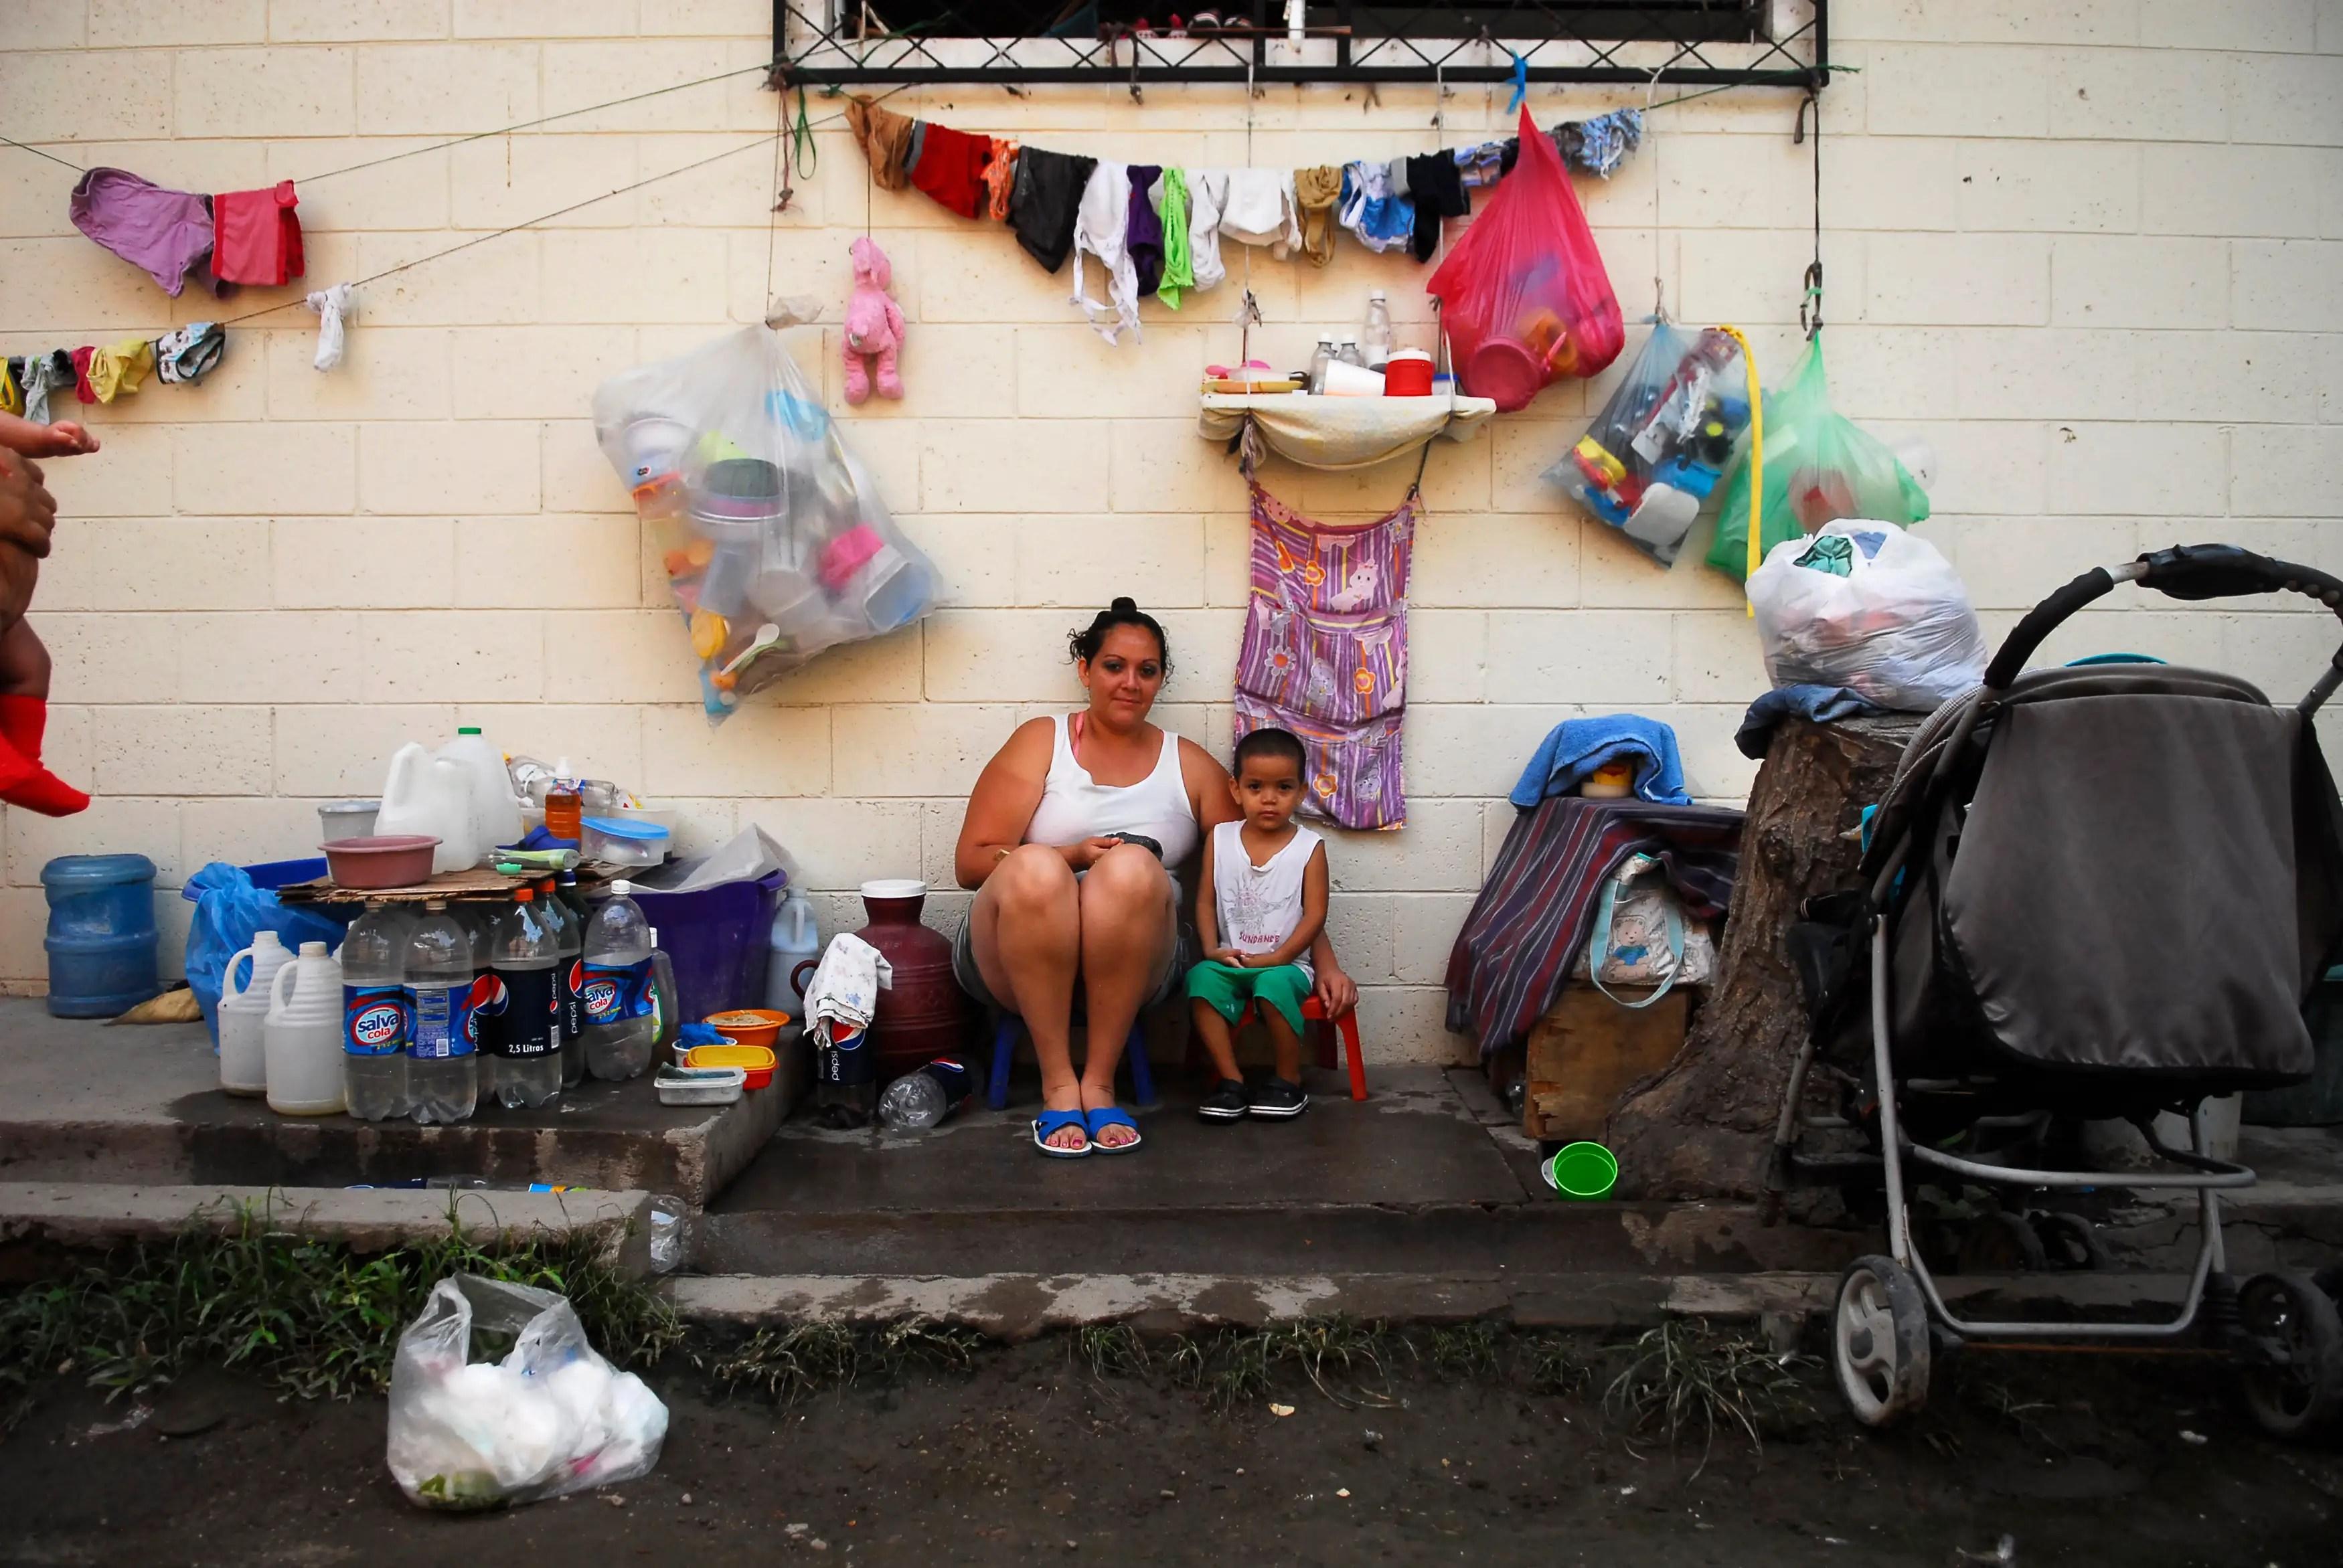 Around 1,700 women are serving time here at Ilopango women's prison in Ilopango, El Salvador, according to Reuters.